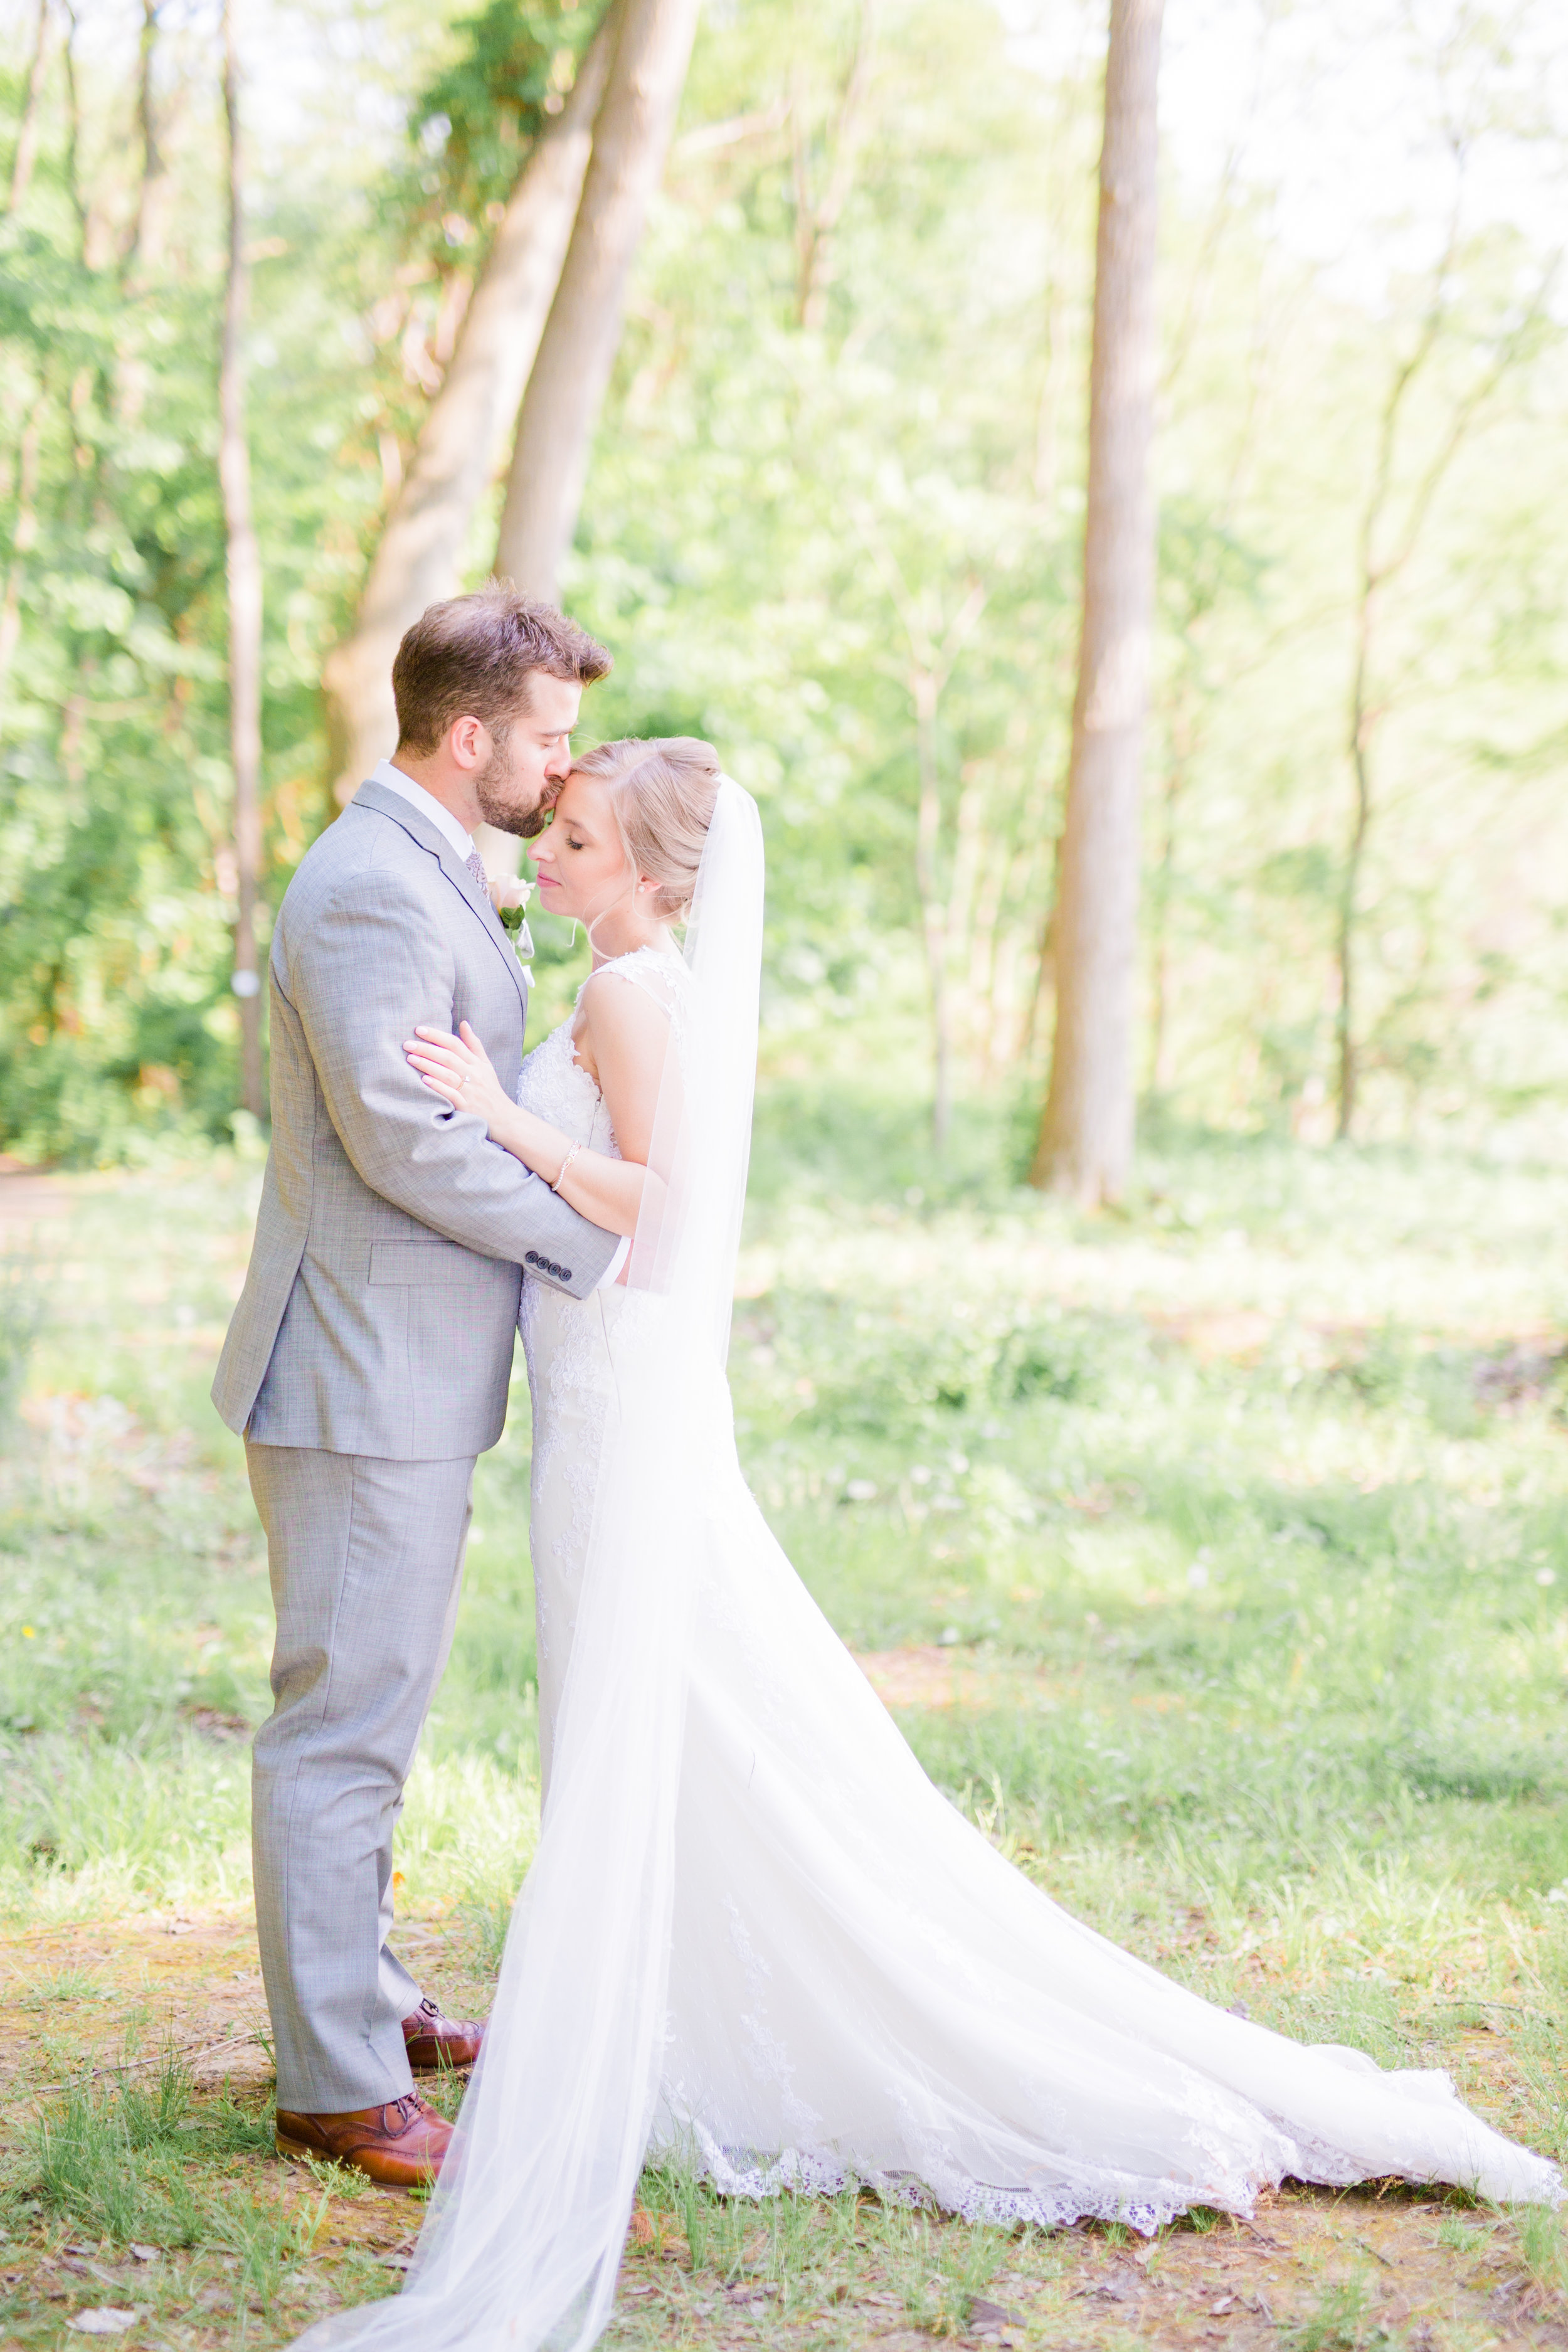 Brittany & Joe Wedding Photography May 27 2018-752.jpg